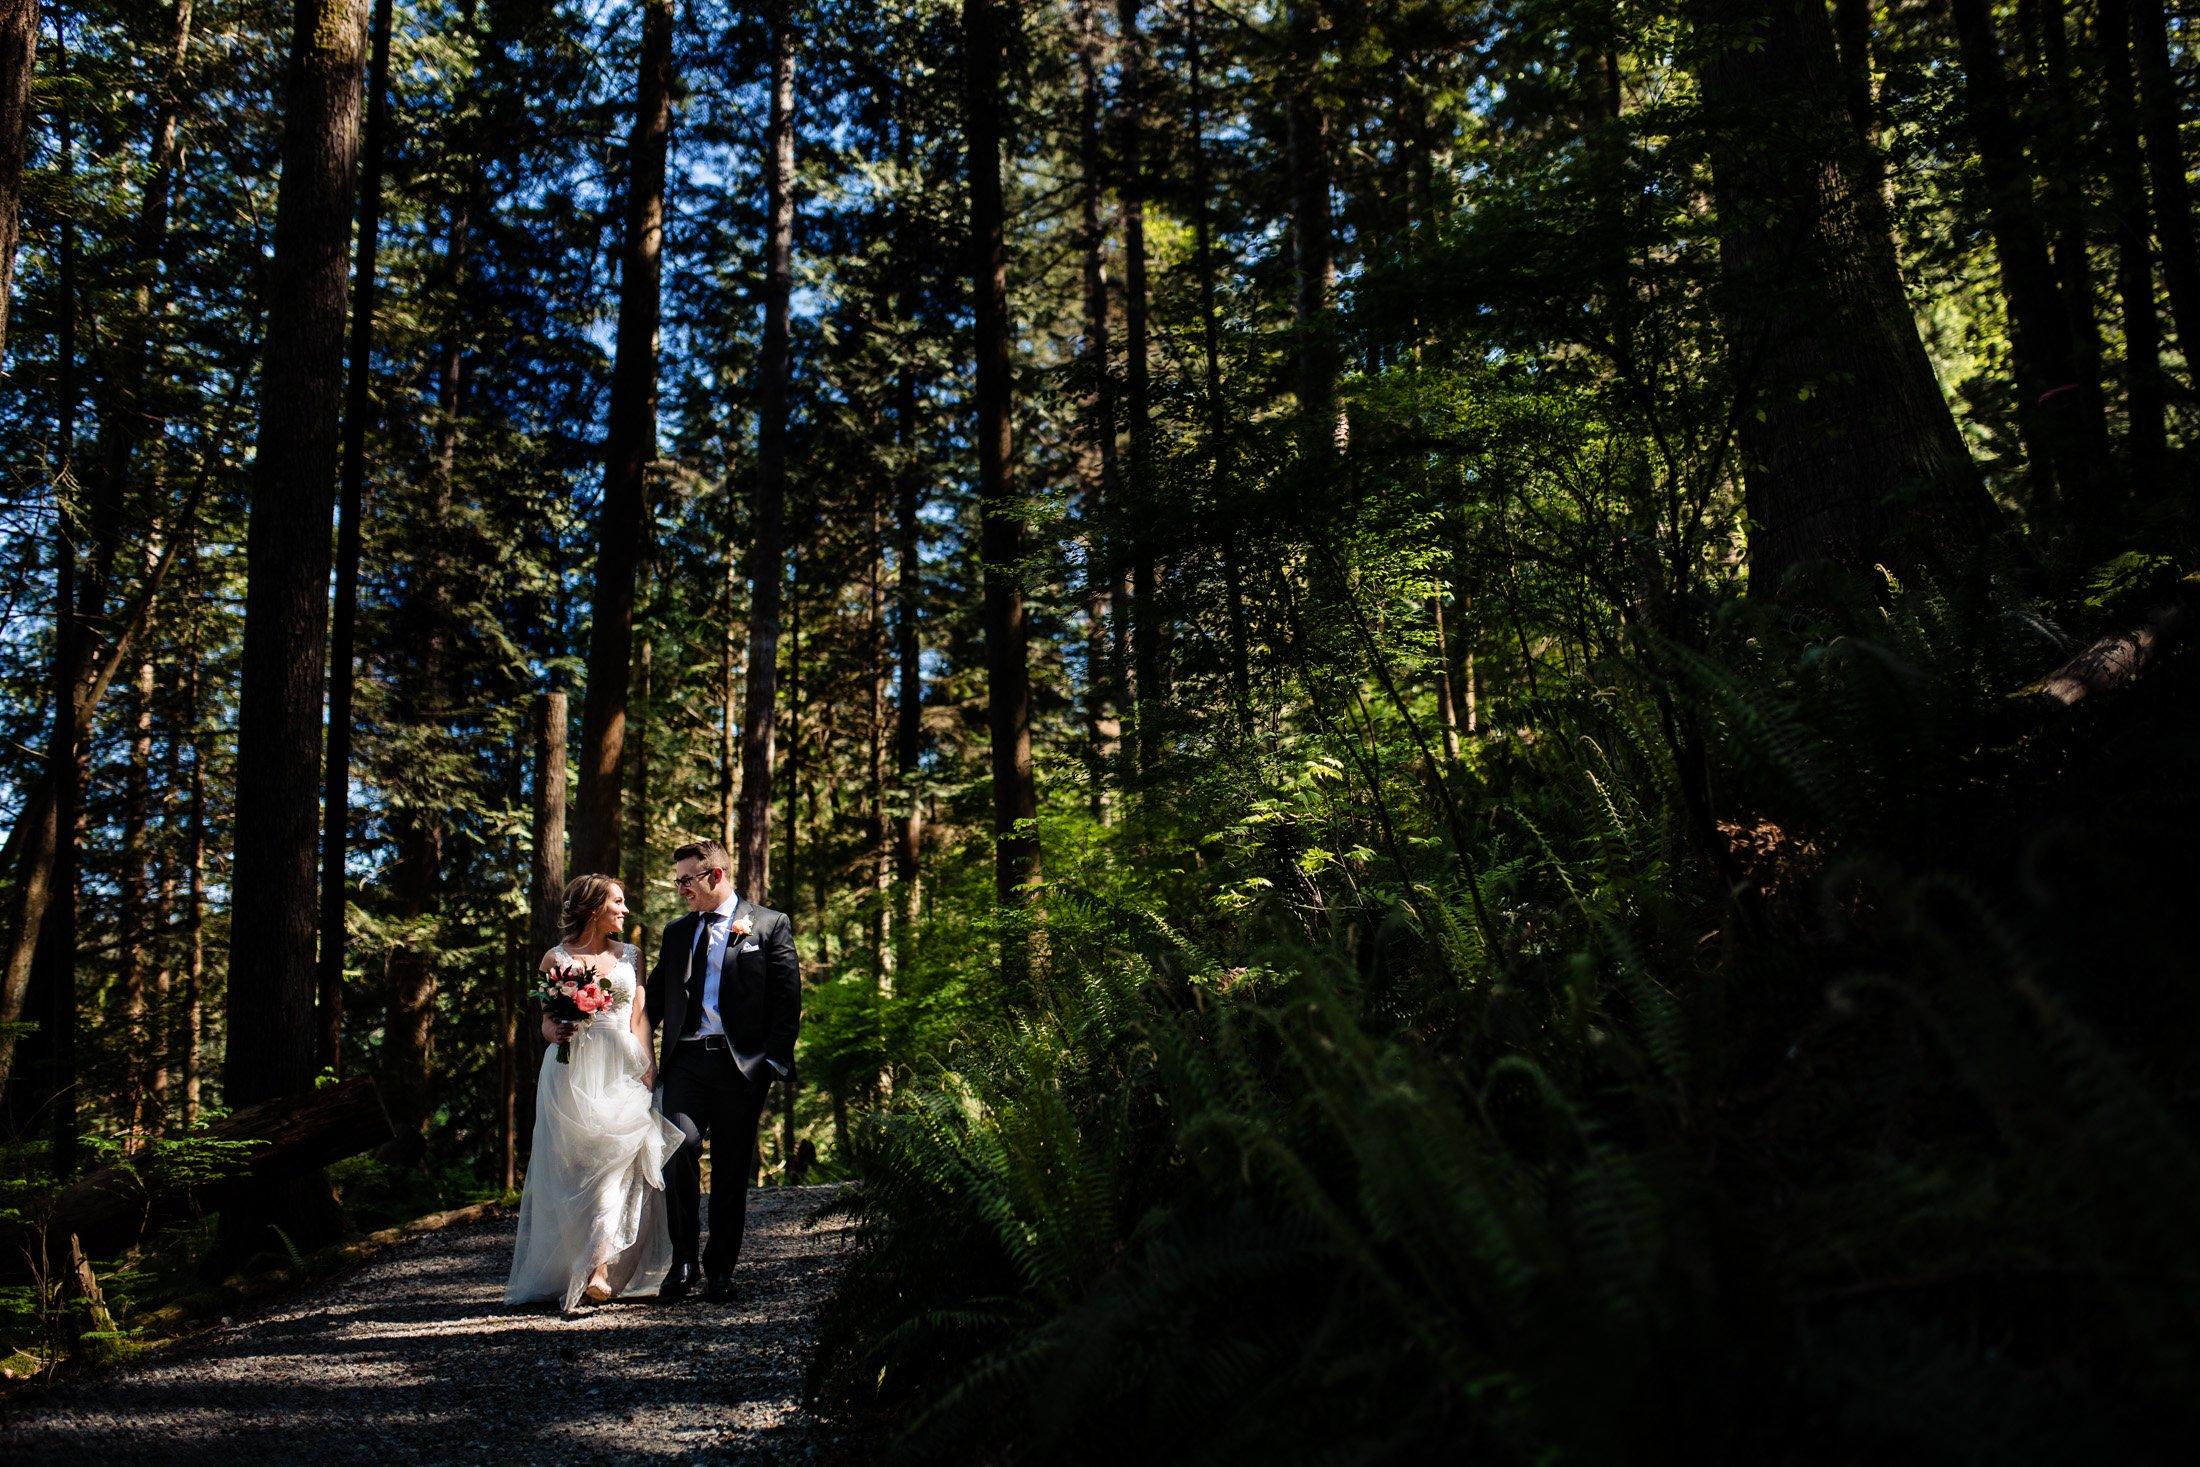 009 - forest wedding coquitlam